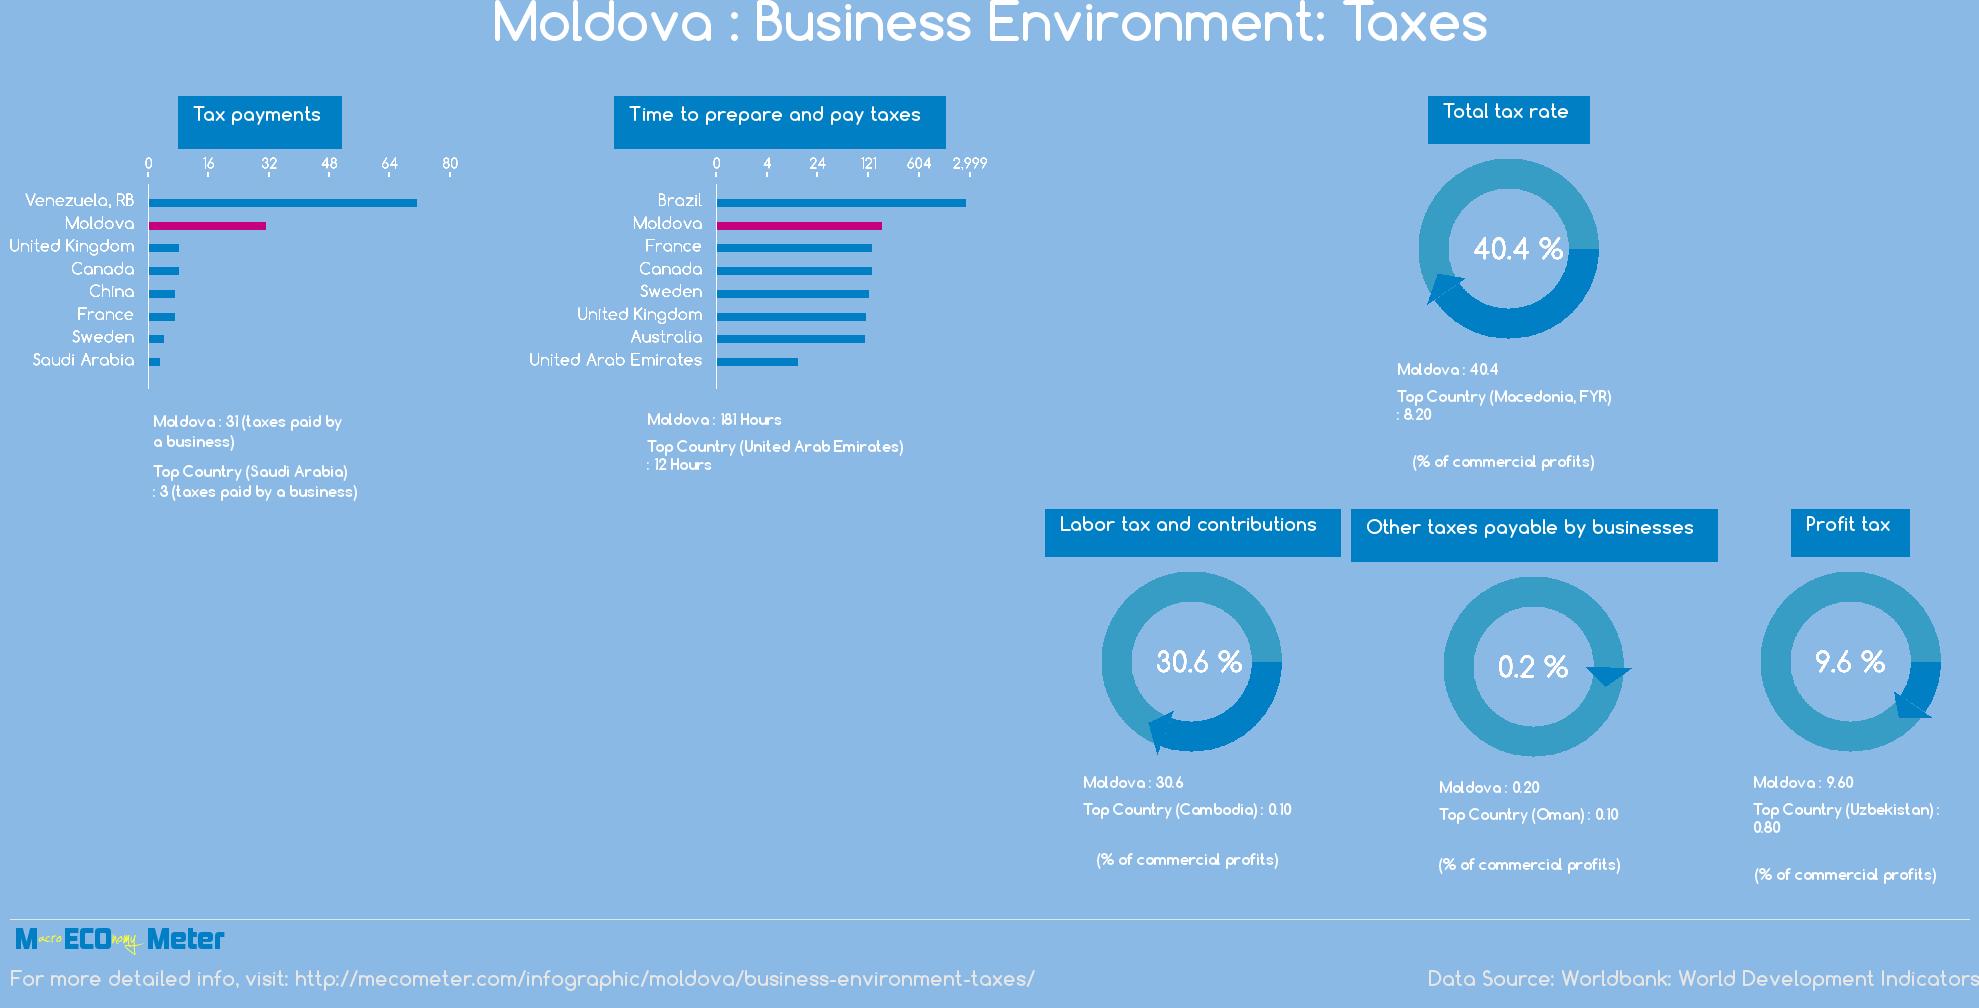 Moldova : Business Environment: Taxes